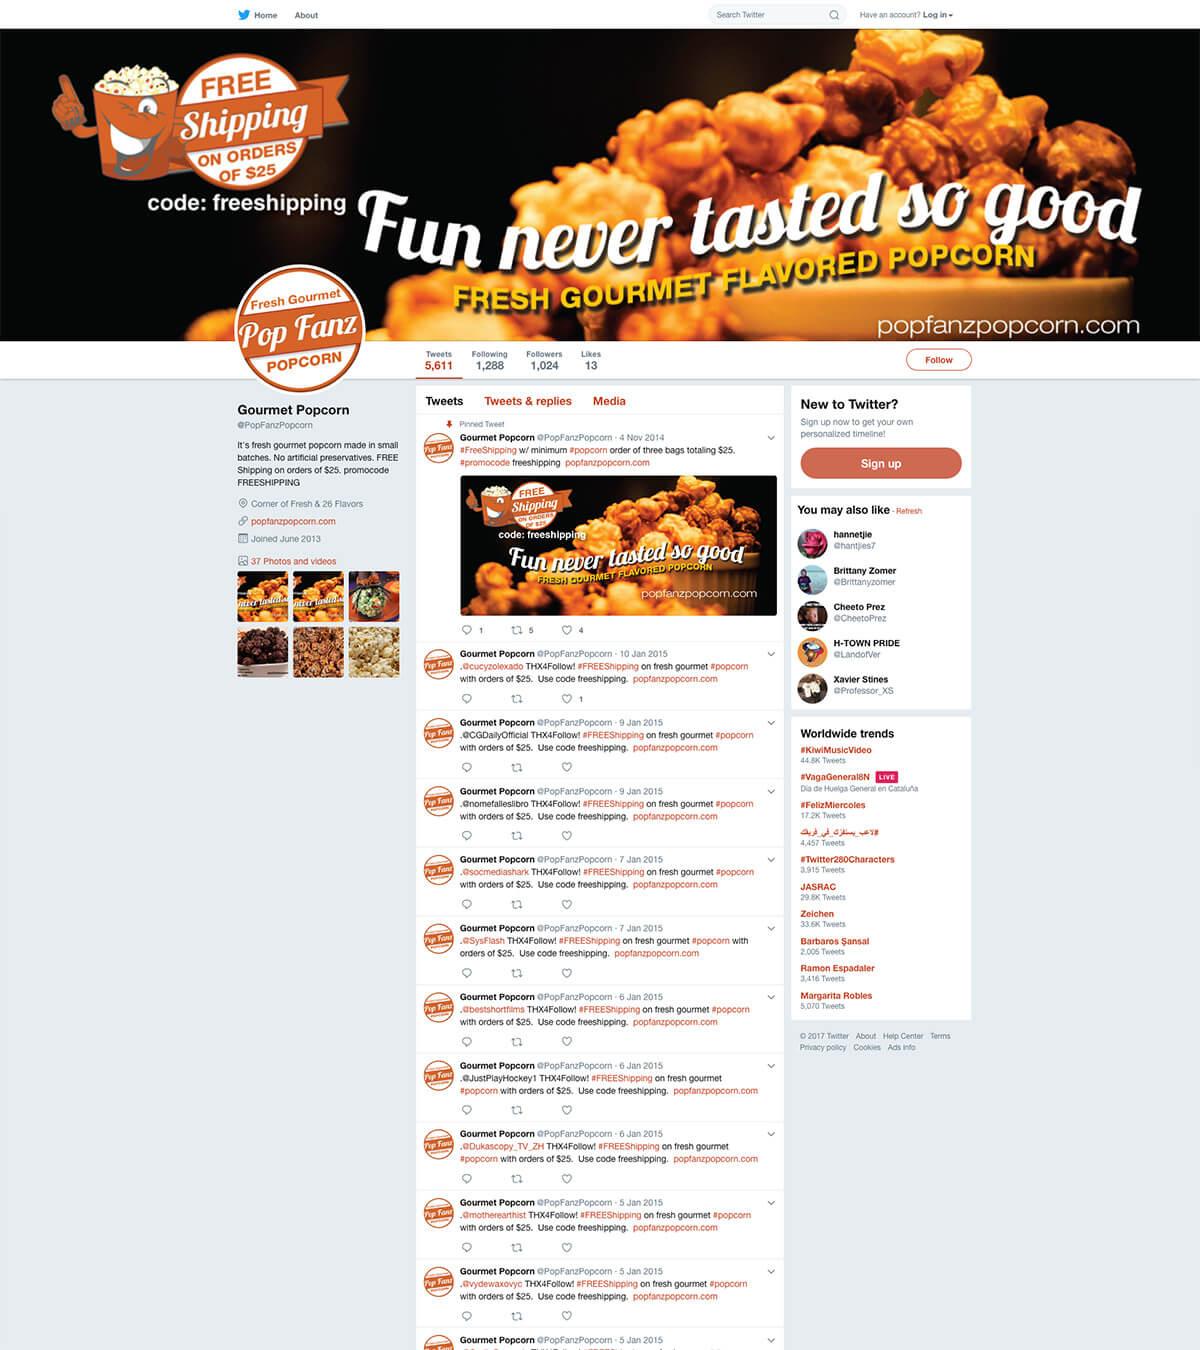 Twitter Page Pop Fanz Popcorn